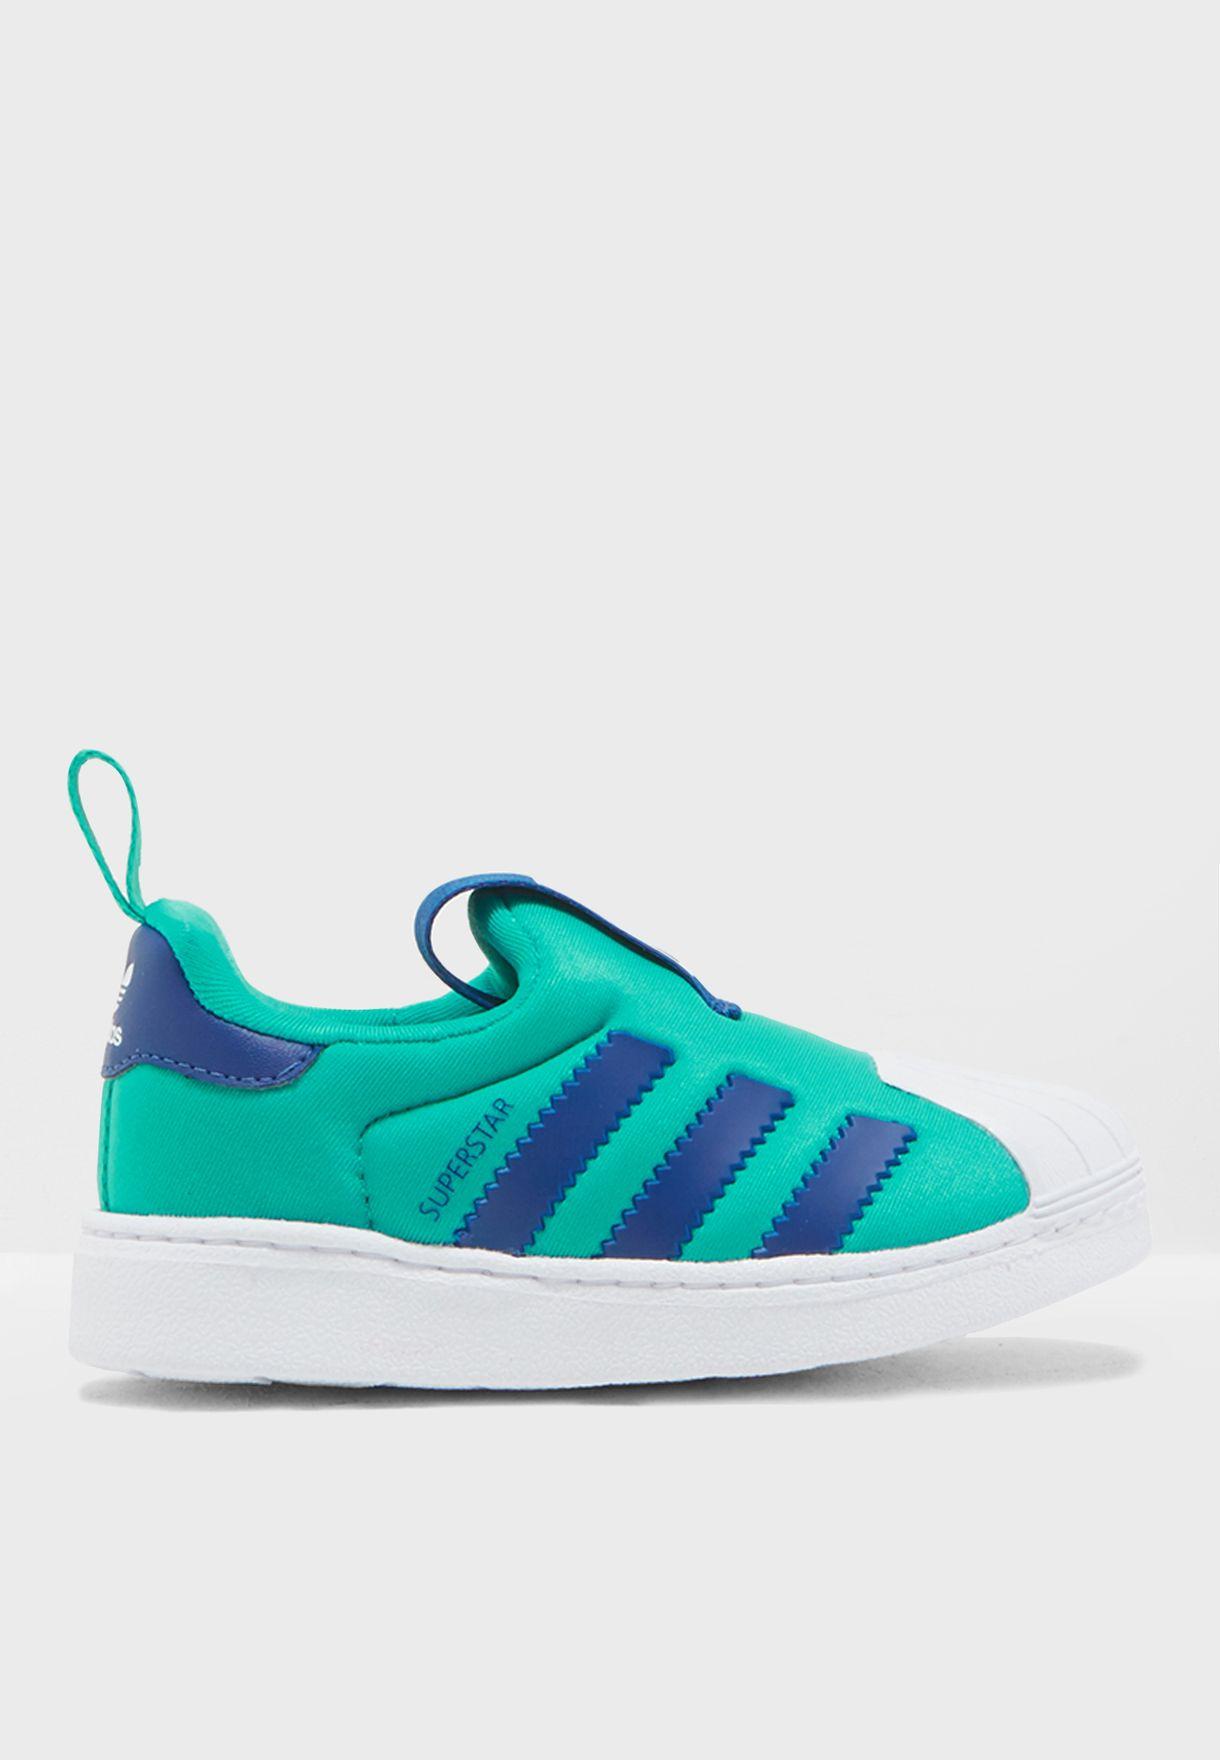 0499bc66d72c4 Shop adidas Originals green Infant Superstar 360 B75621 for Kids in ...